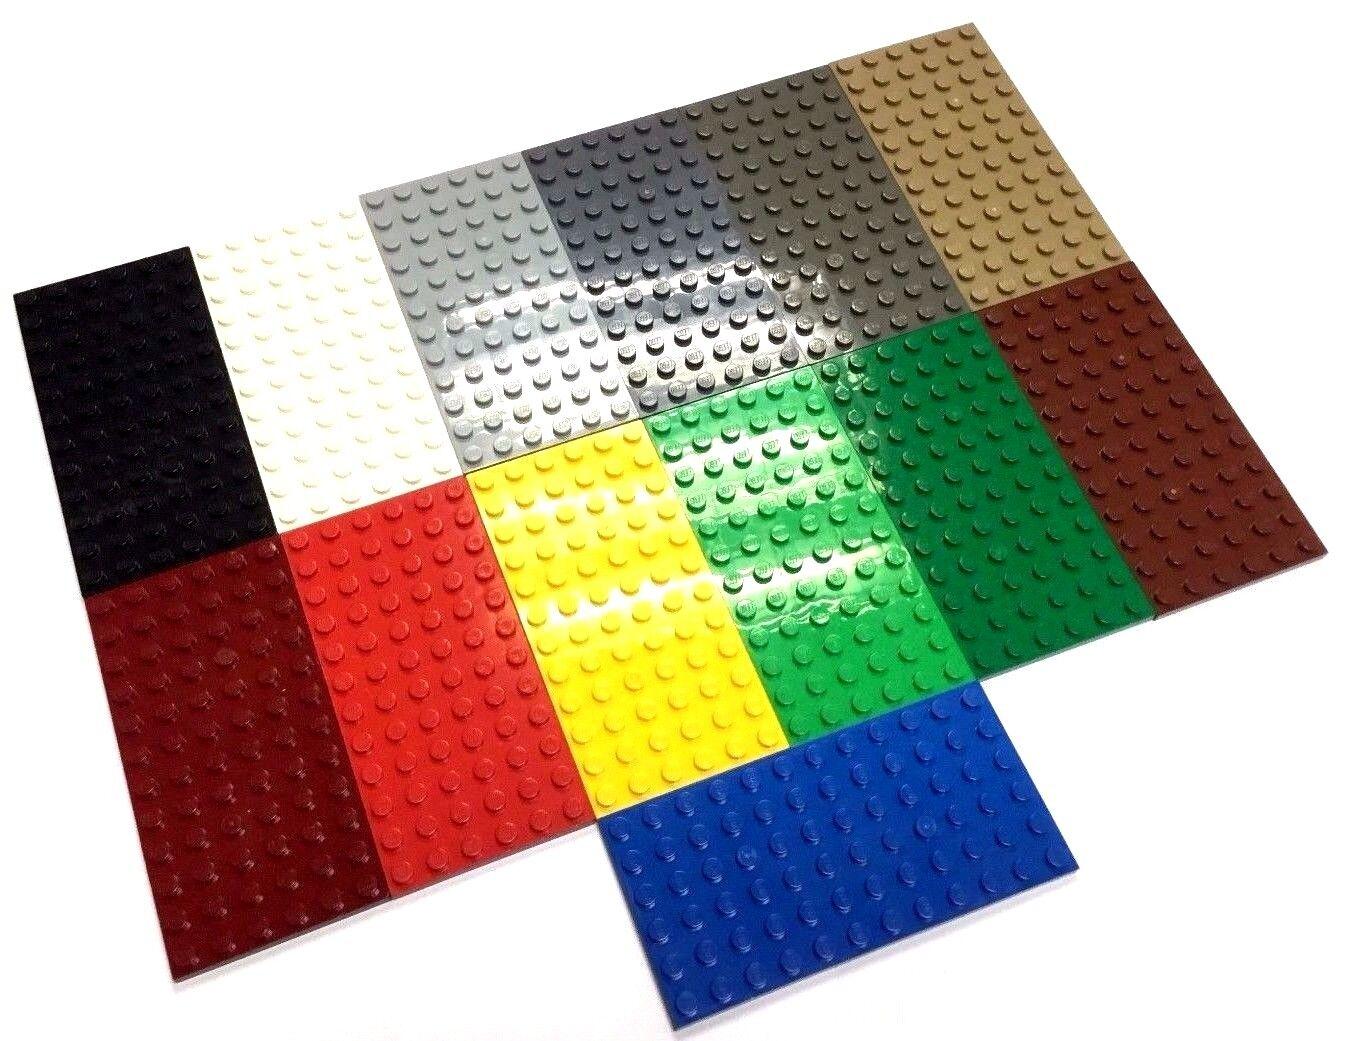 Lego 2 x 3028 bright light green 6 x 12 baseplate Free uk p/&p